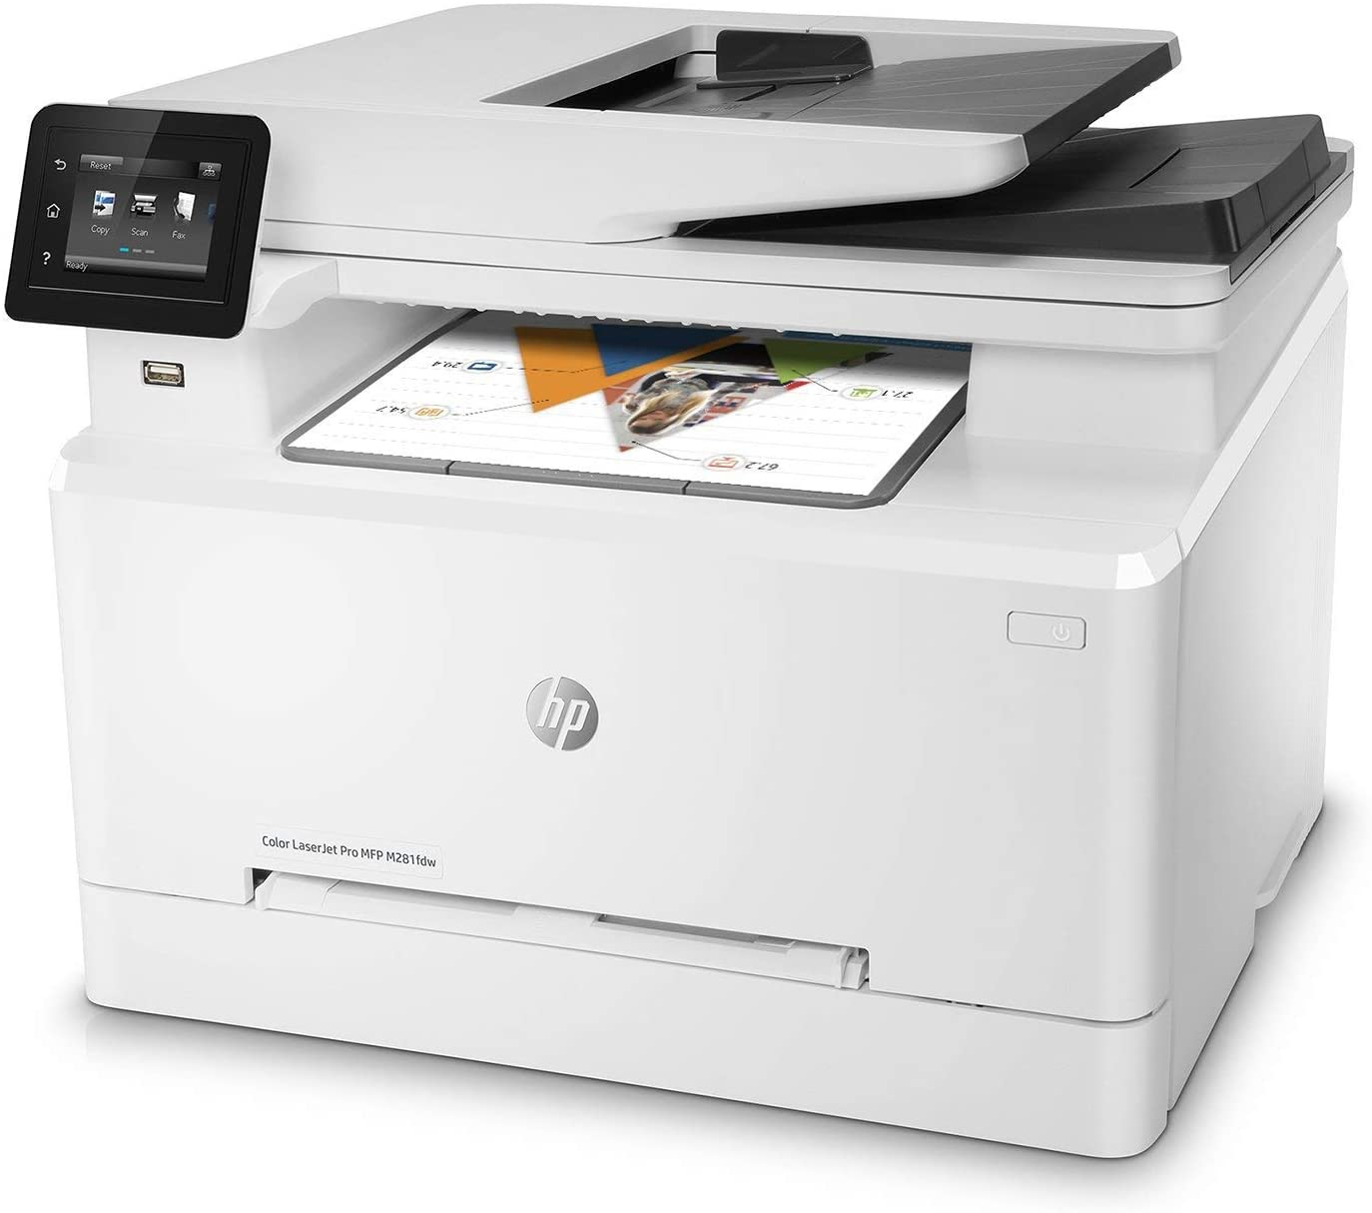 HP Laserjet Pro All in One, Wireless Color Multifunction Laser Printer, Comes with Original HP Toner, T6B83AR#BGJ, (Renewed)